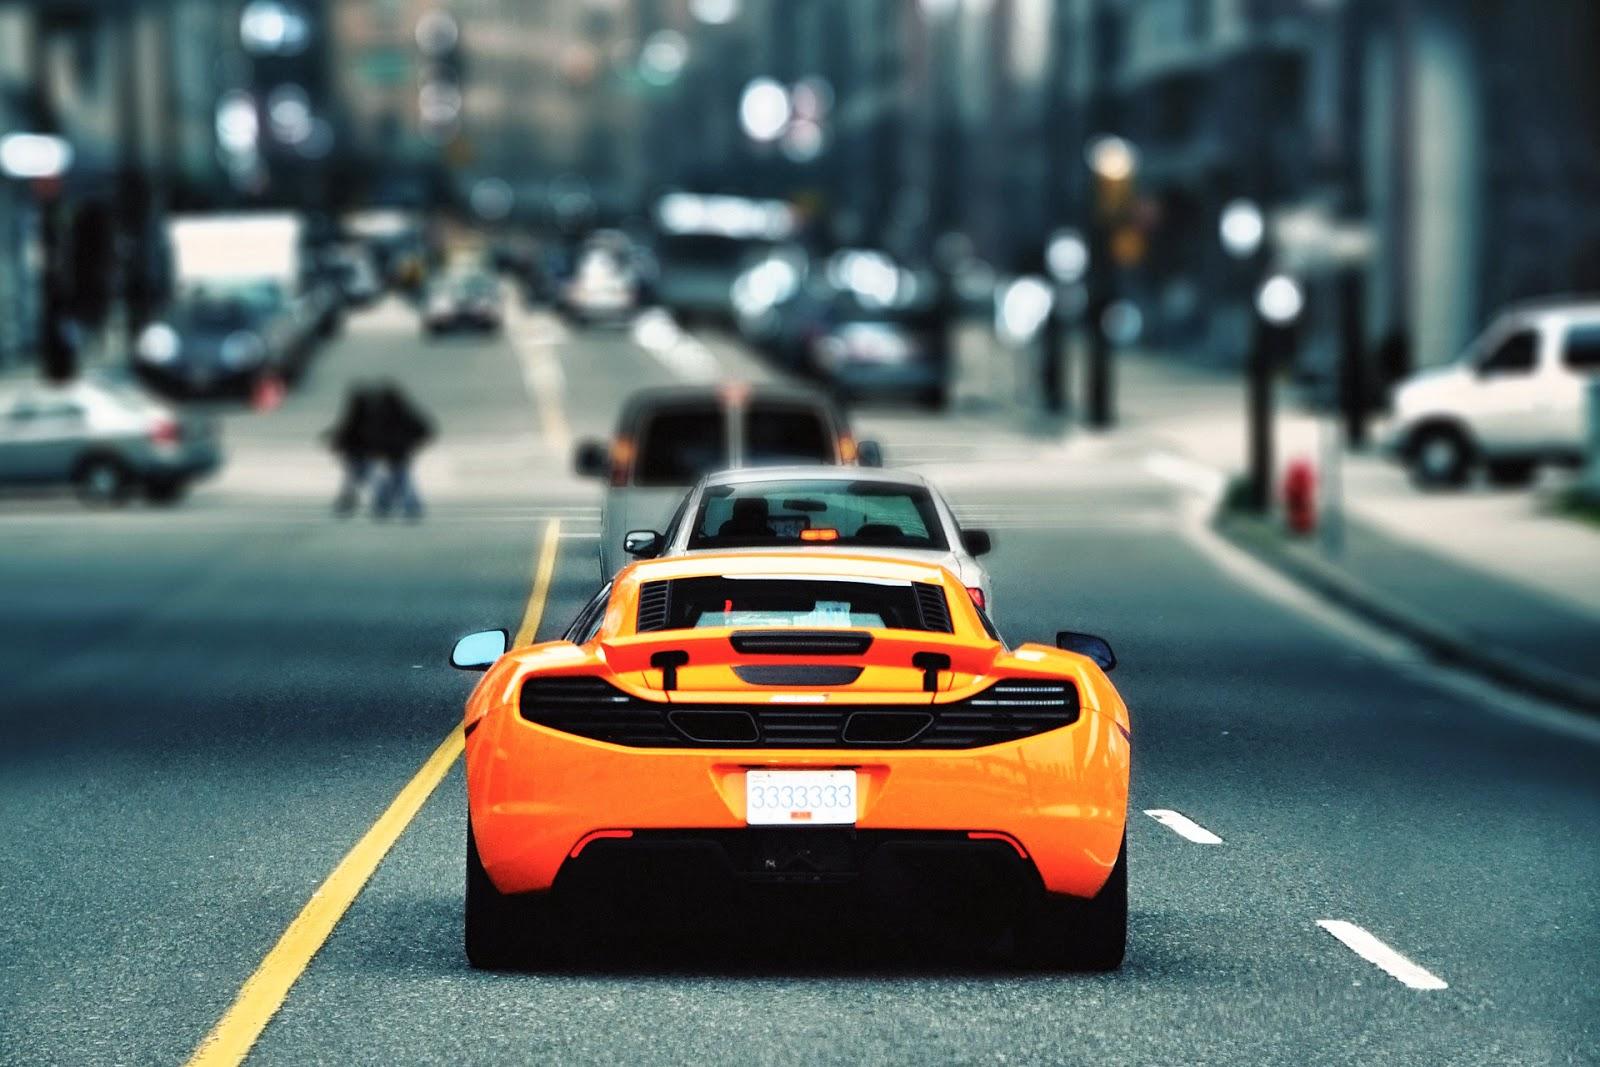 car wallpapers 2014, iphone car, fast cool cars, sports cars, bumblebee cars, bugatti cars, desktop s, honda cars s, 3d black cars s (7)